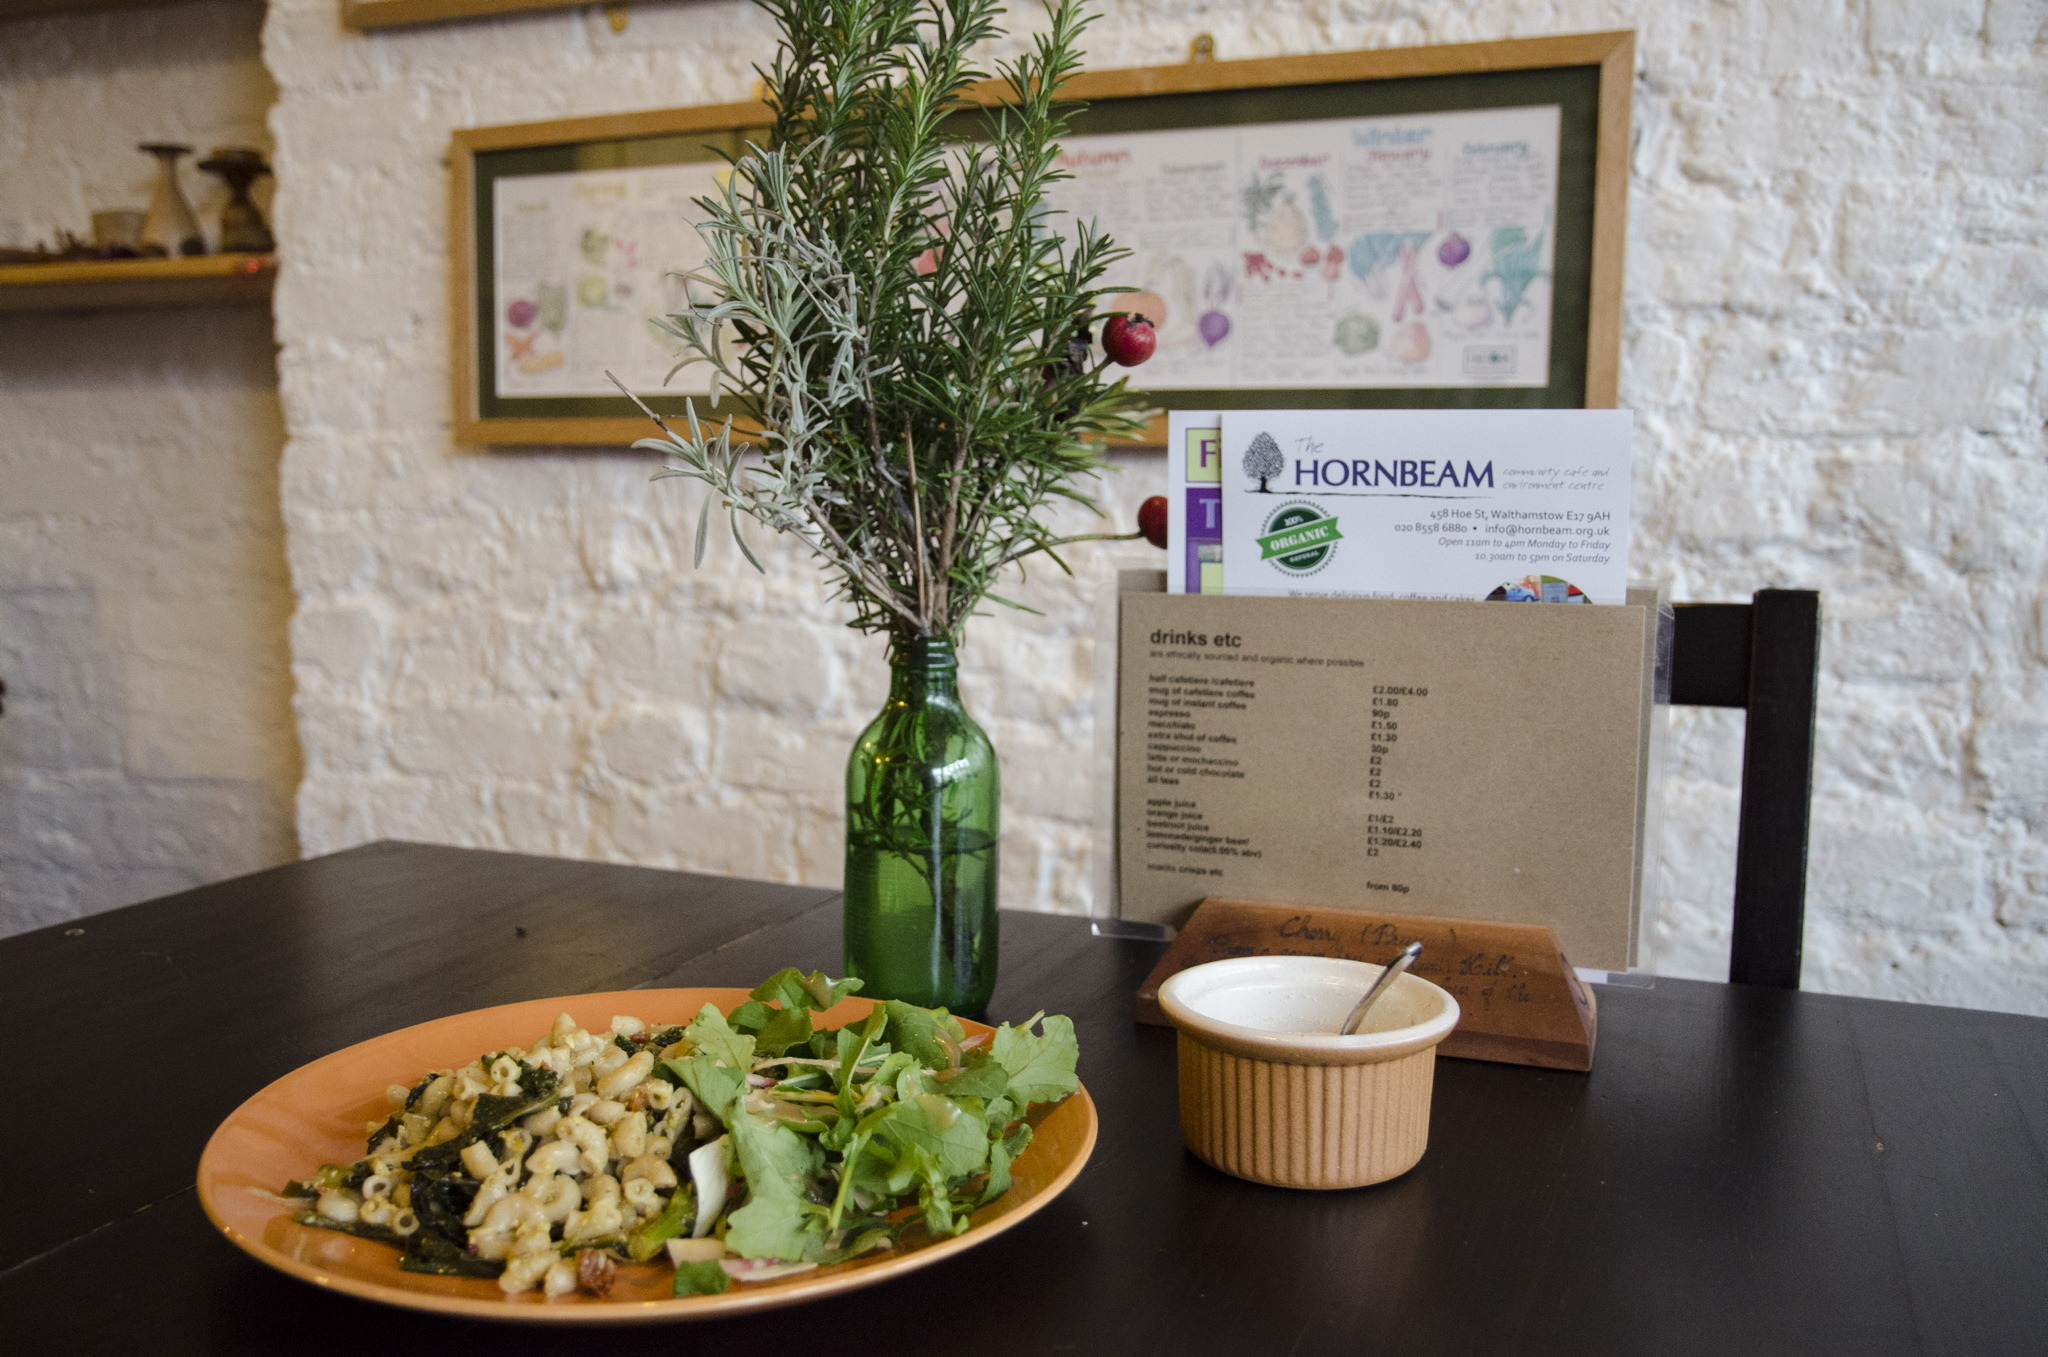 Hornbeam Café